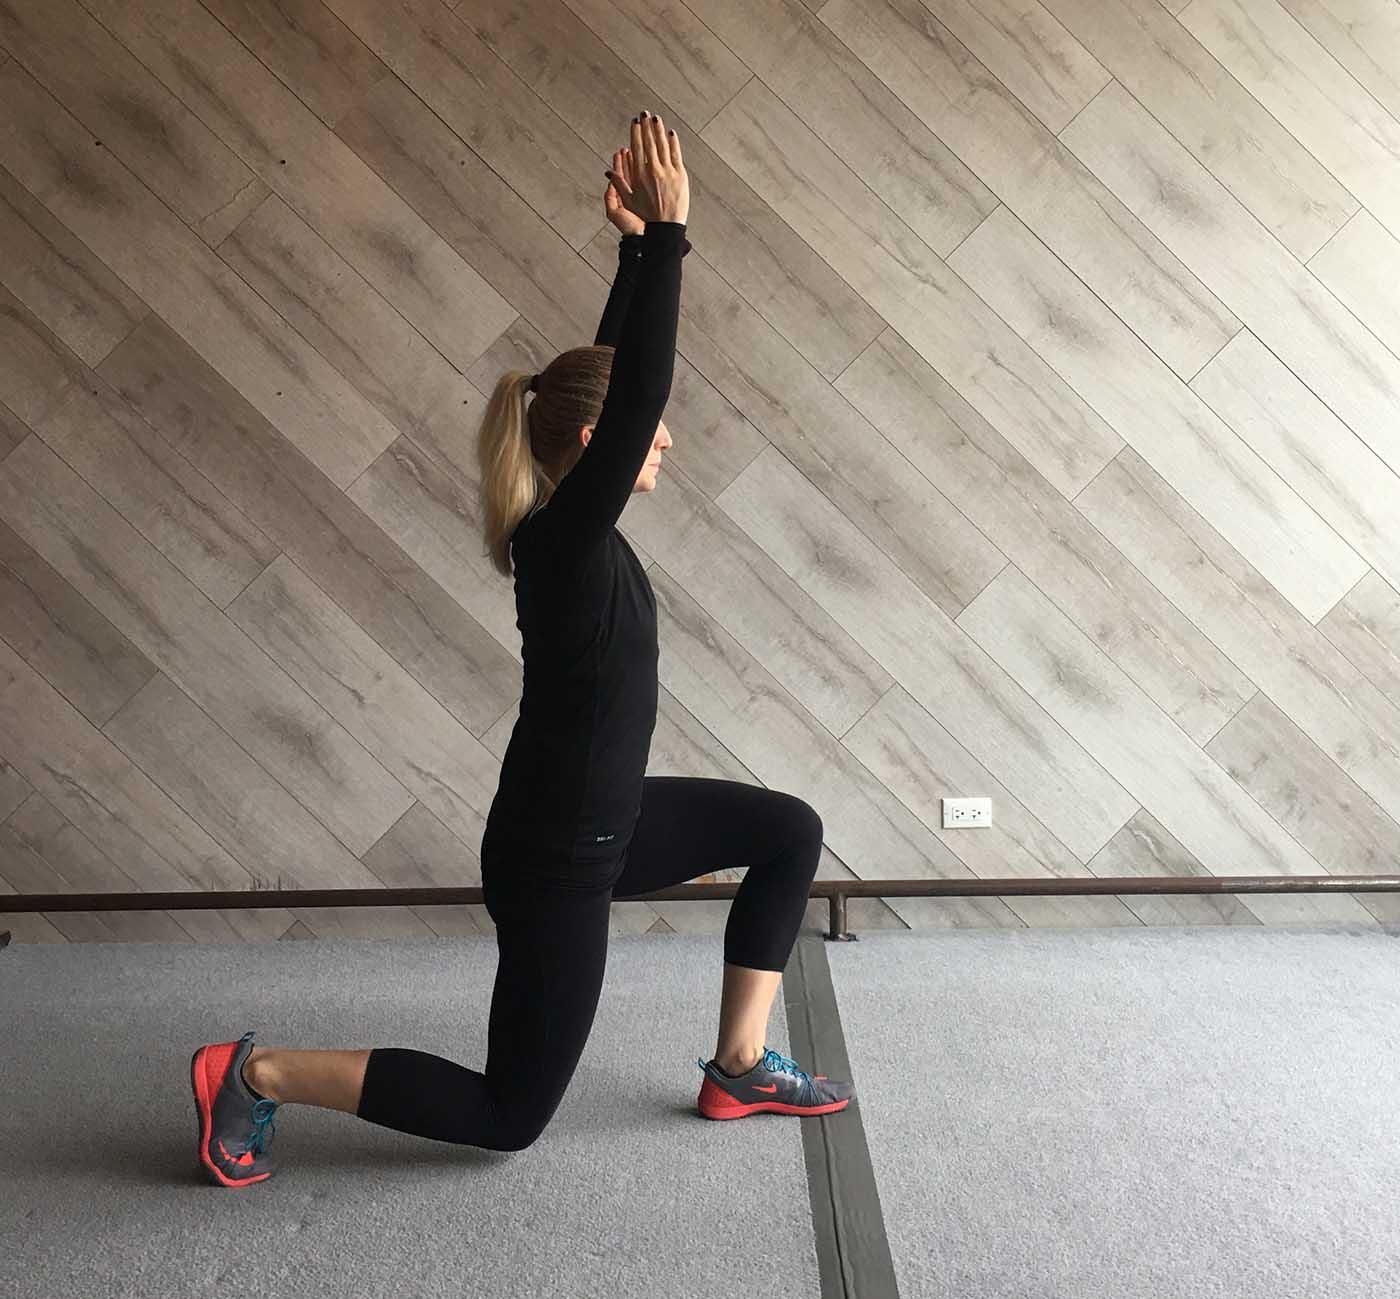 asweatlife_treadmill-challenge_overhead-lunge_2